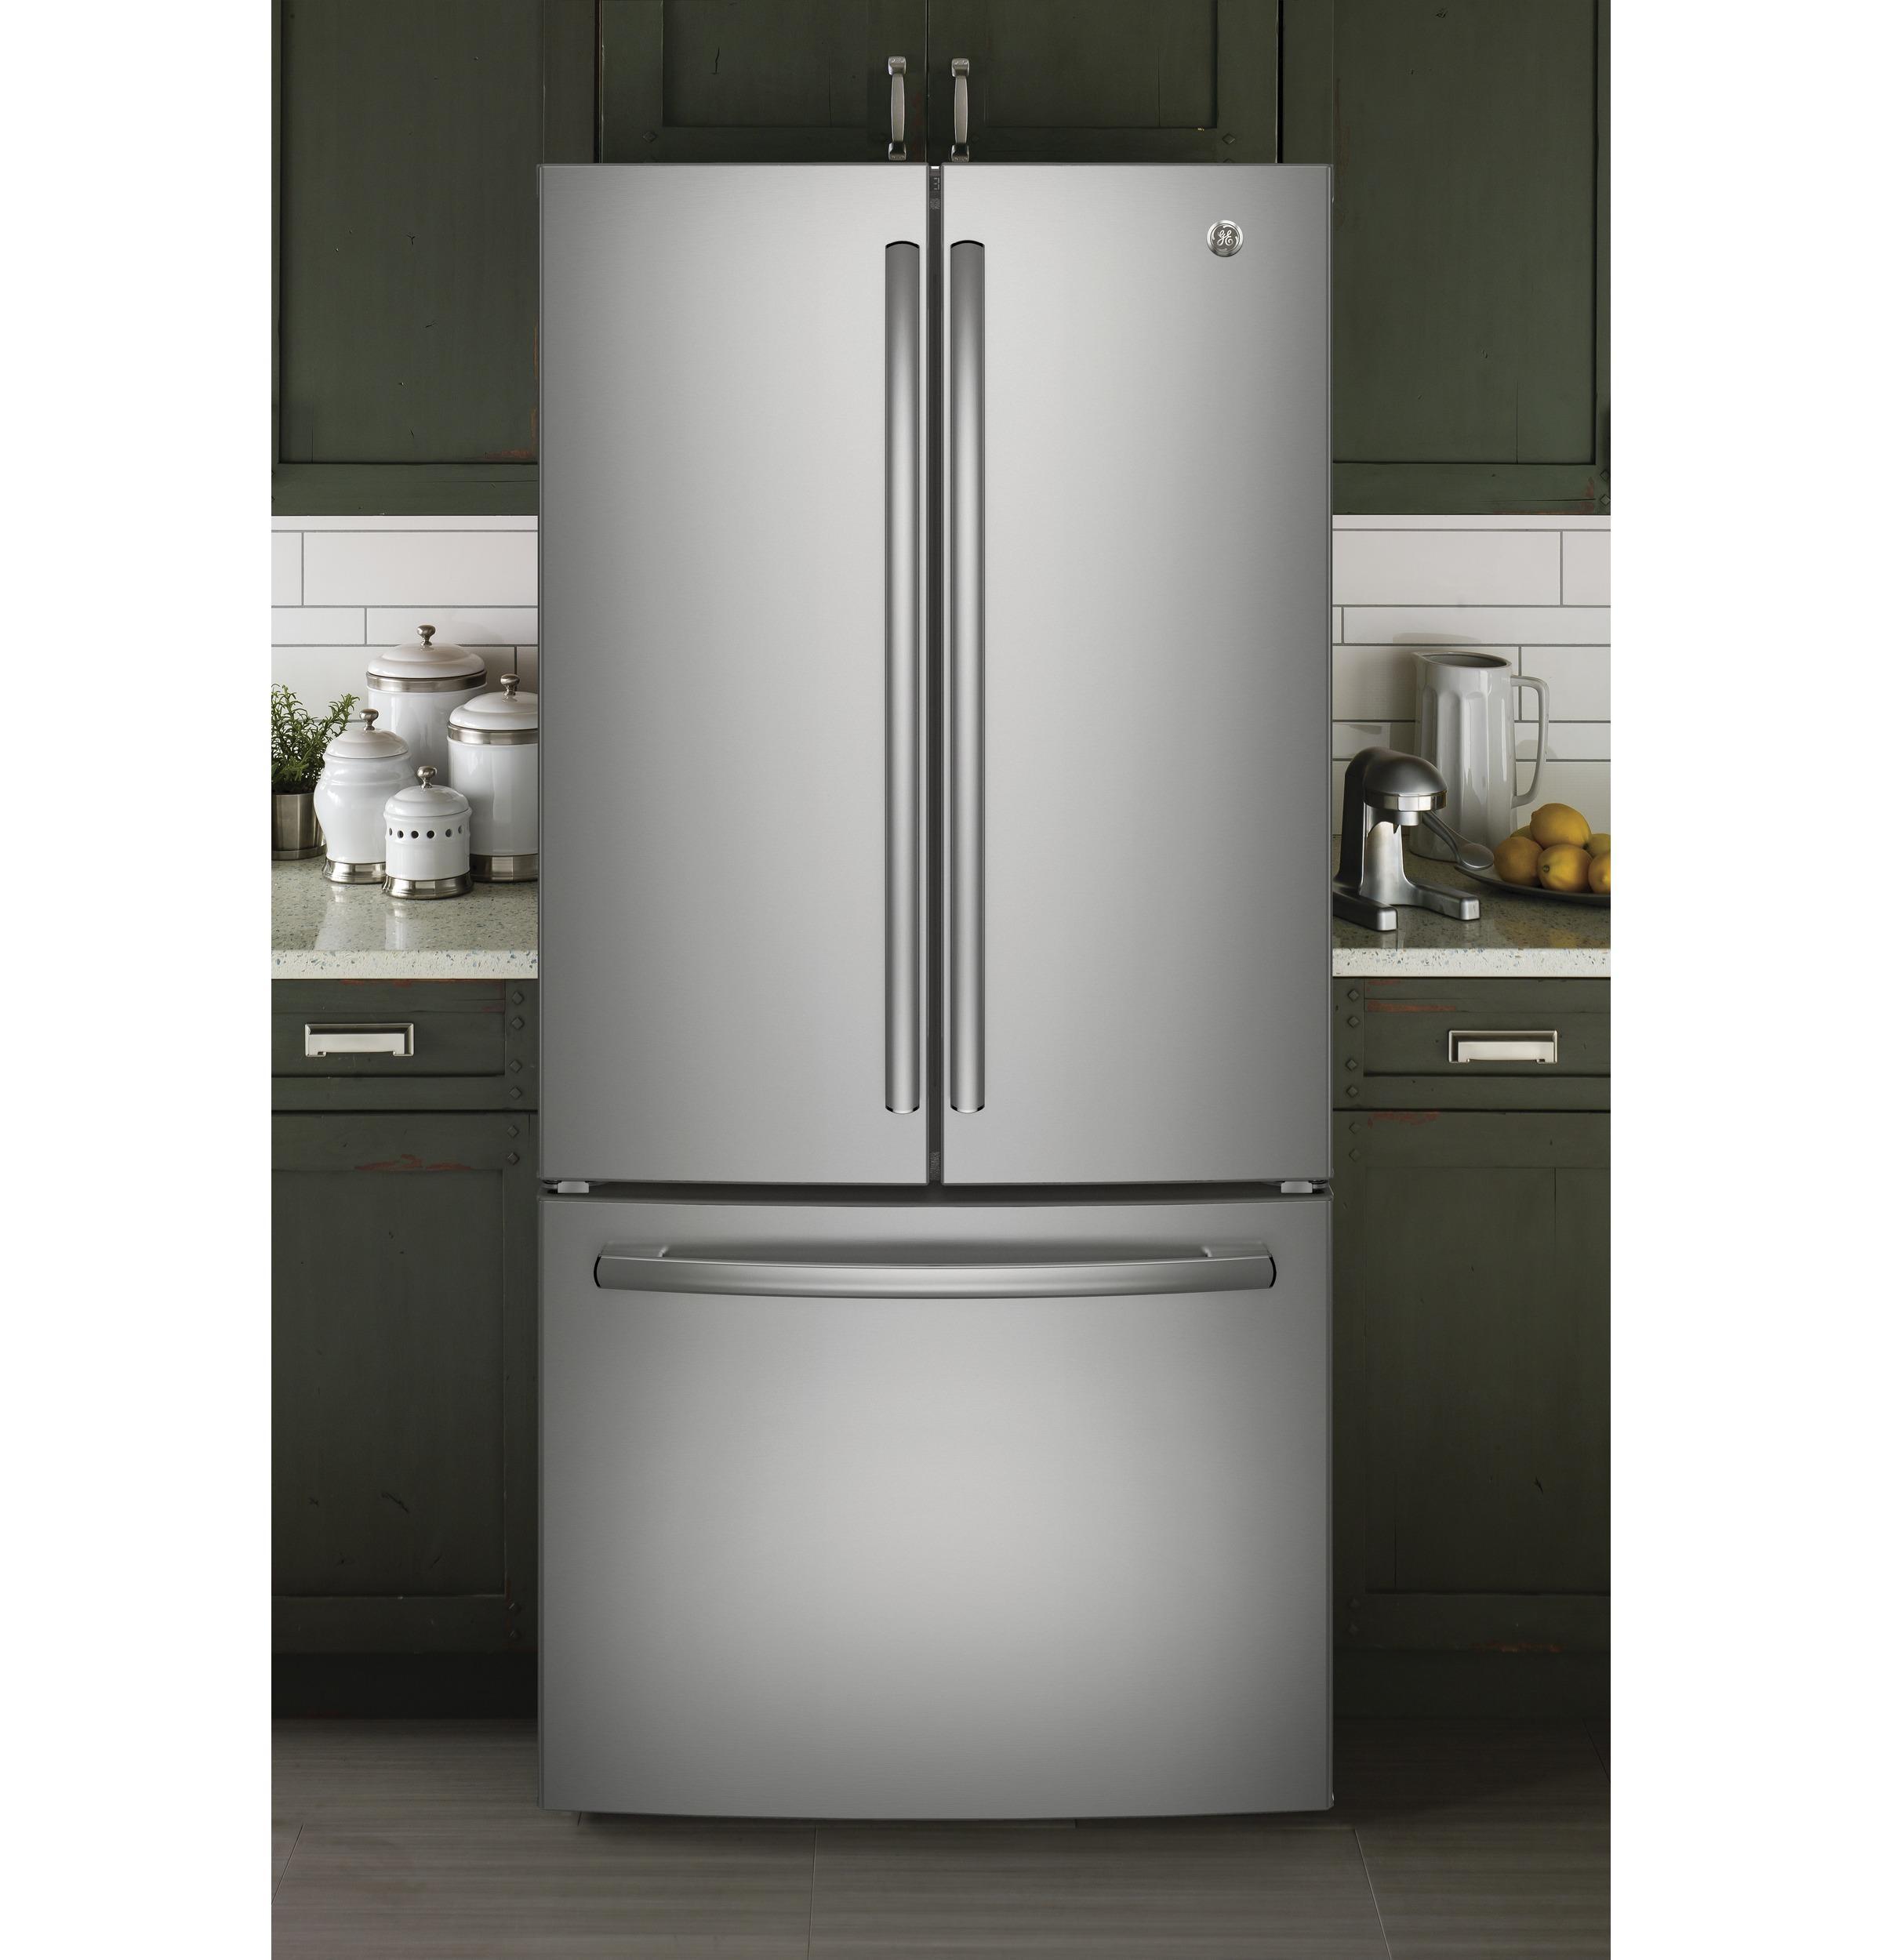 GE U0026reg;energy Staru0026reg; 18.6 Cu. Ft. Counter Depth French Door Refrigerator